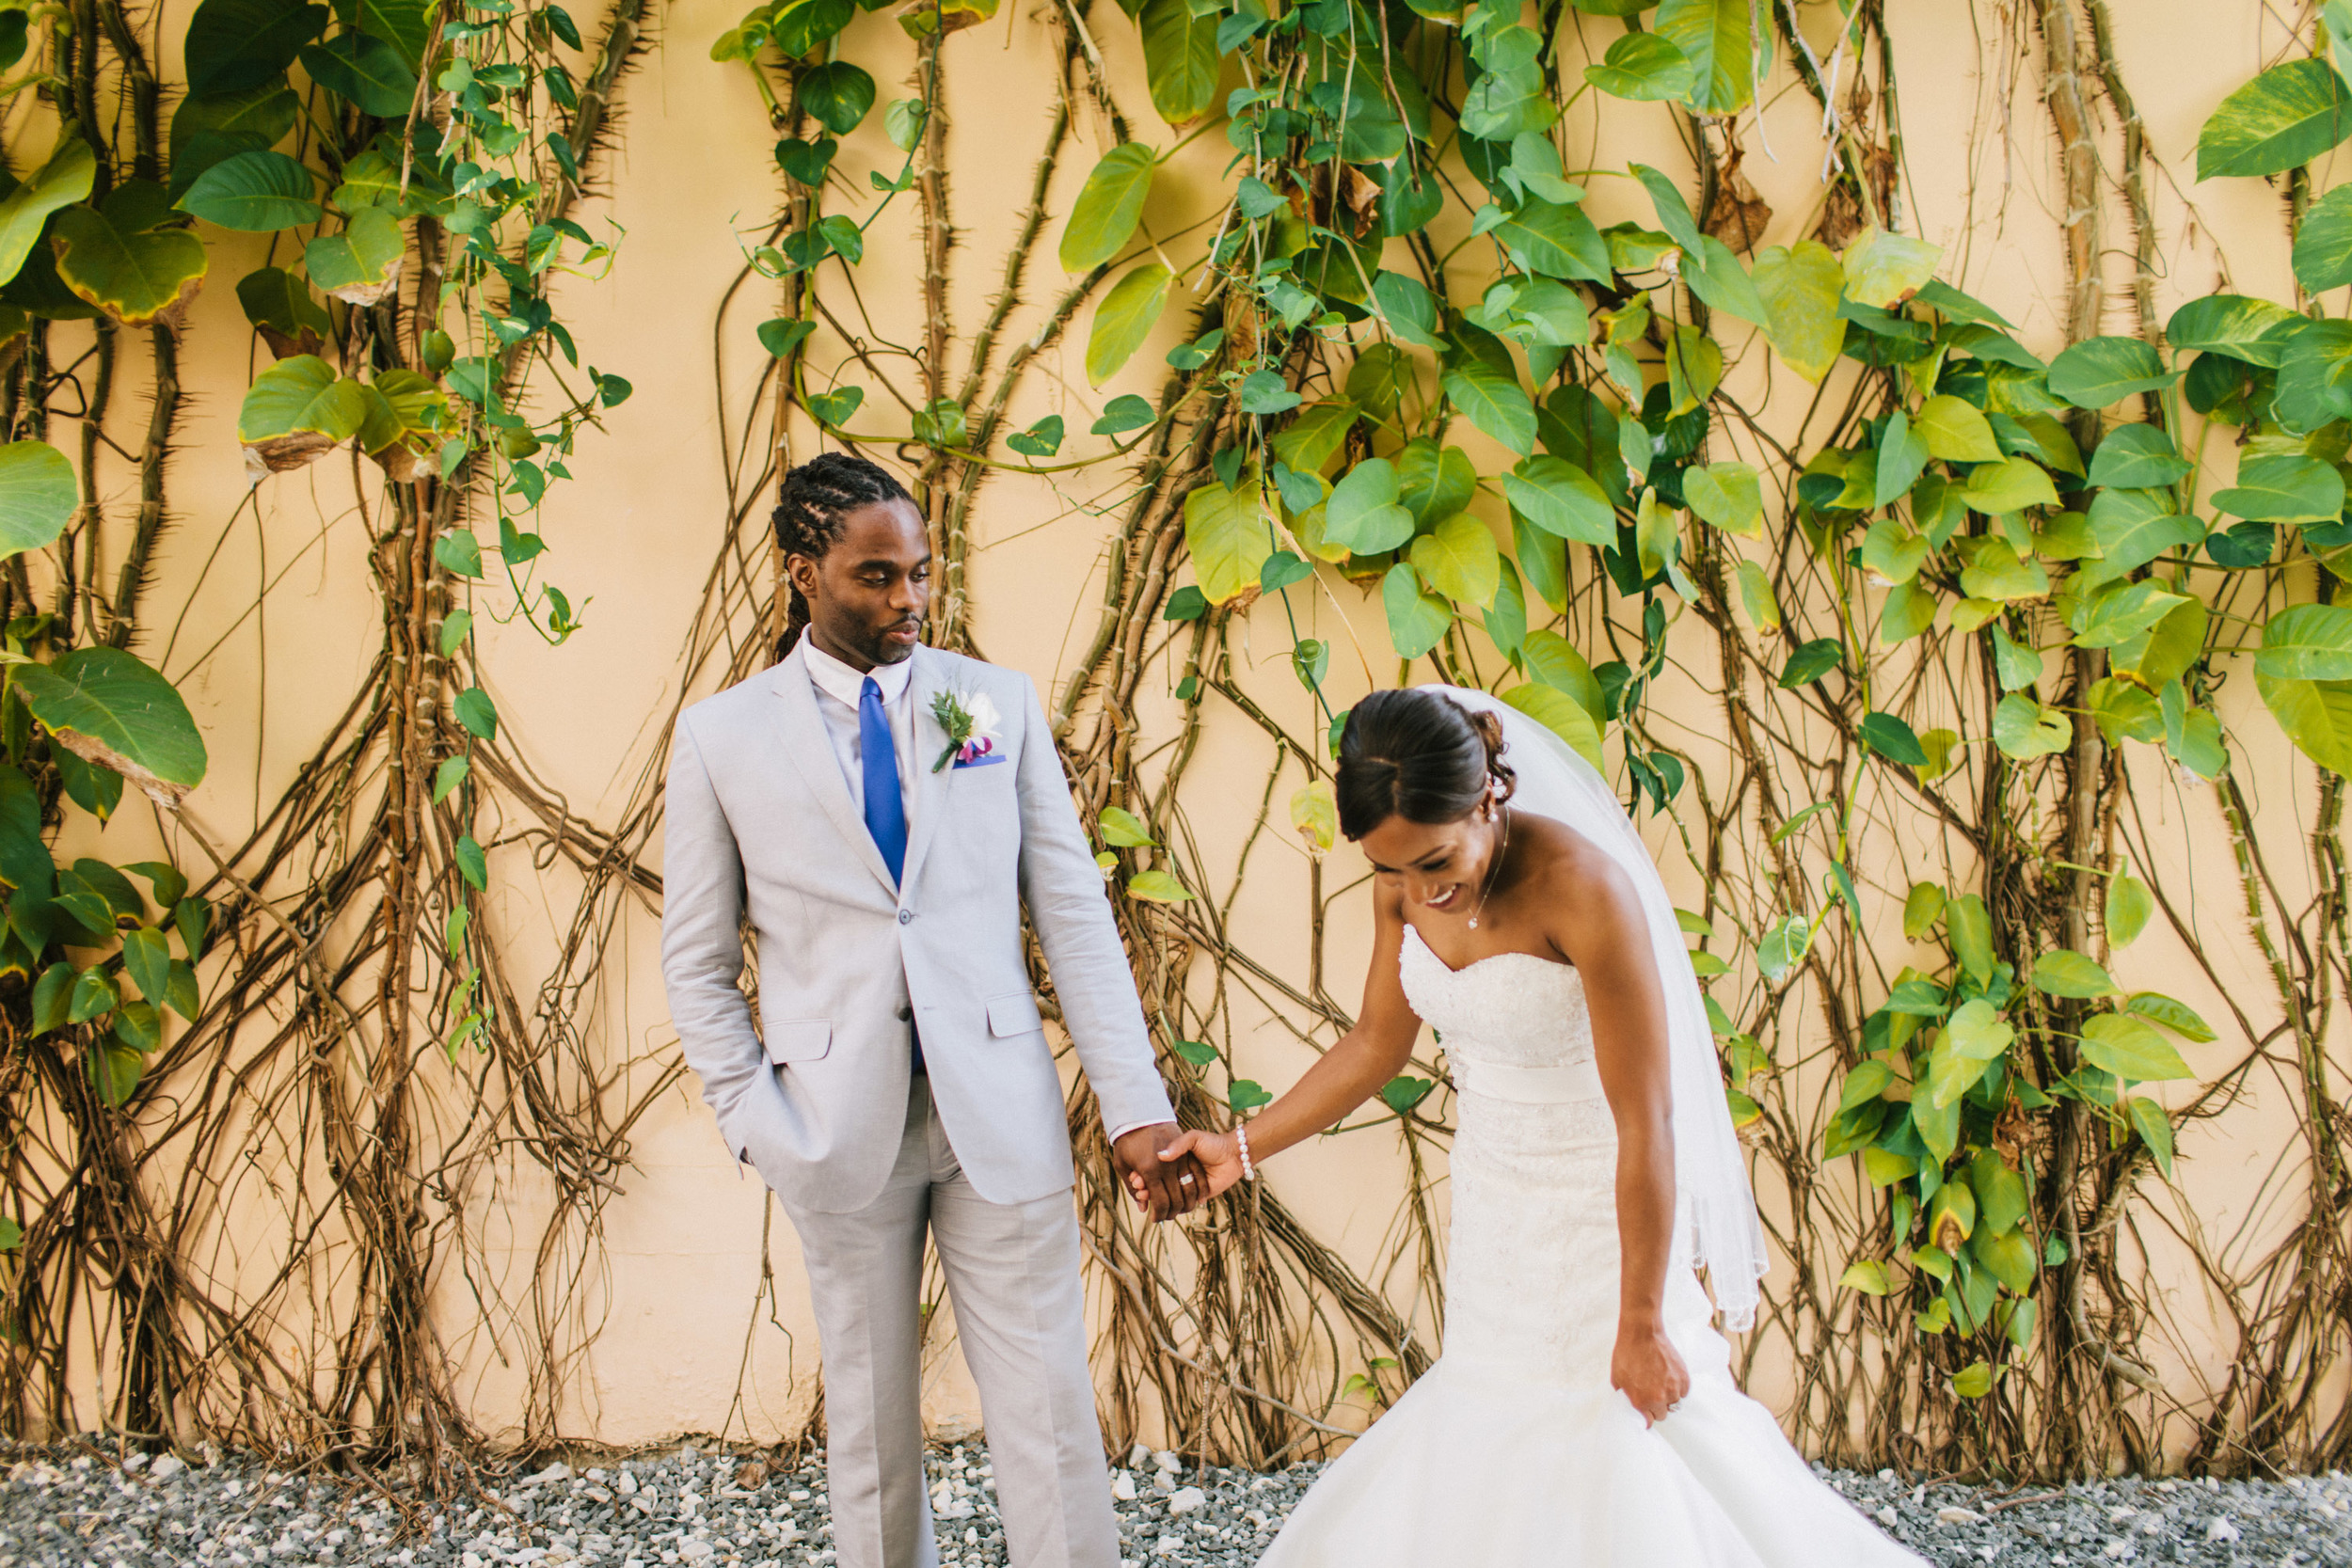 michael-rousseau-photography-dominican-republic-destination-wedding-cara-jason-colonial-majestic-dominican-republic090.jpg